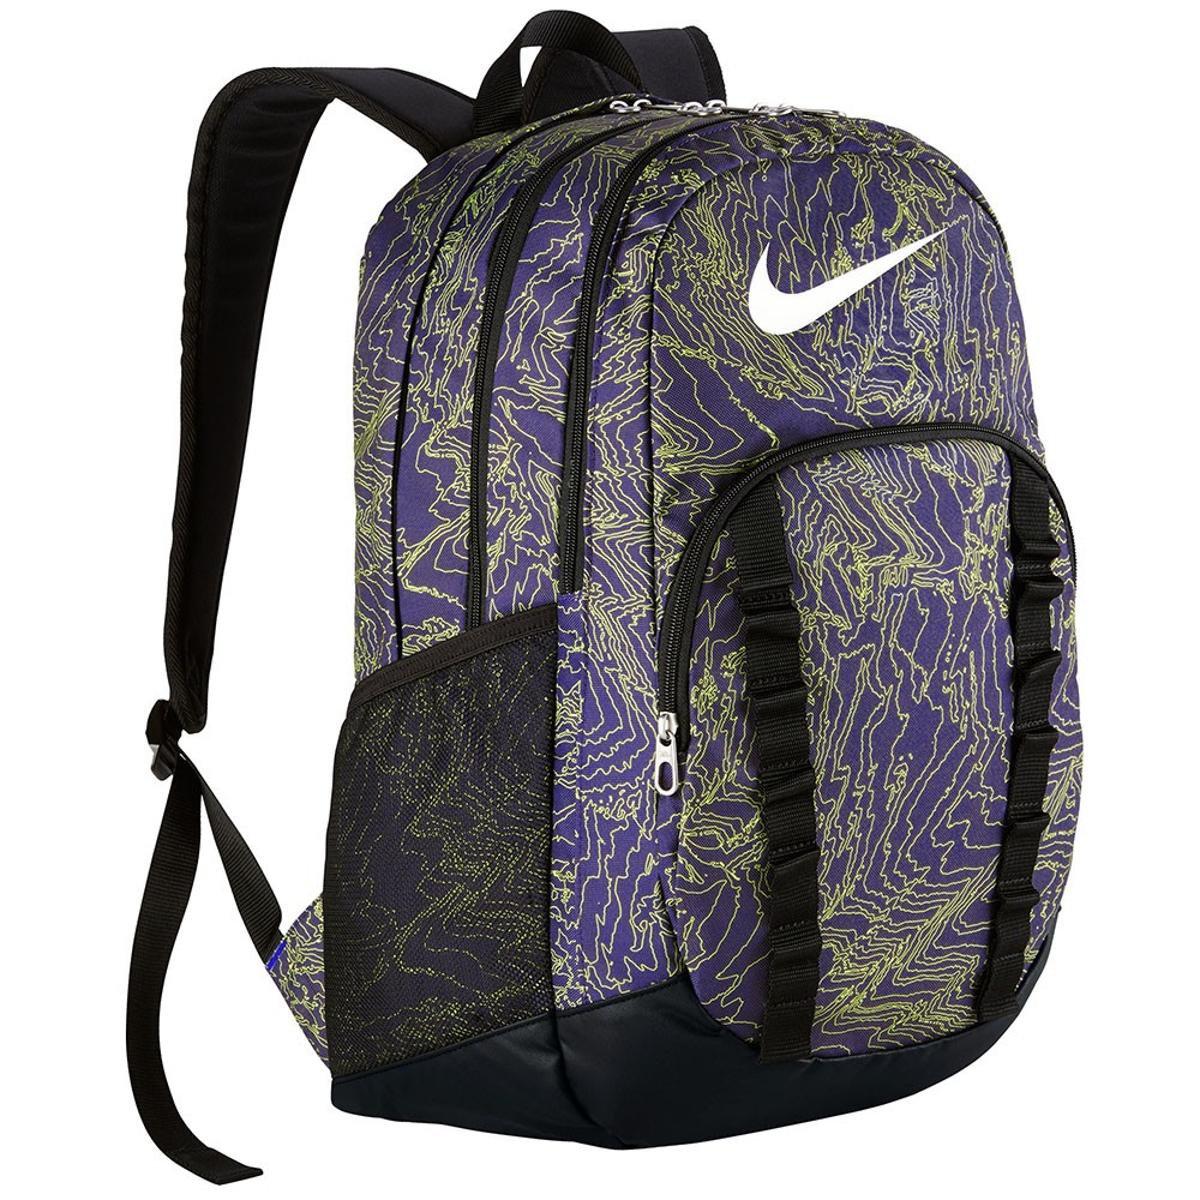 156b027d6 Mochila Nike Brasilia 7 Backpack Graphic XL - Compre Agora | Netshoes